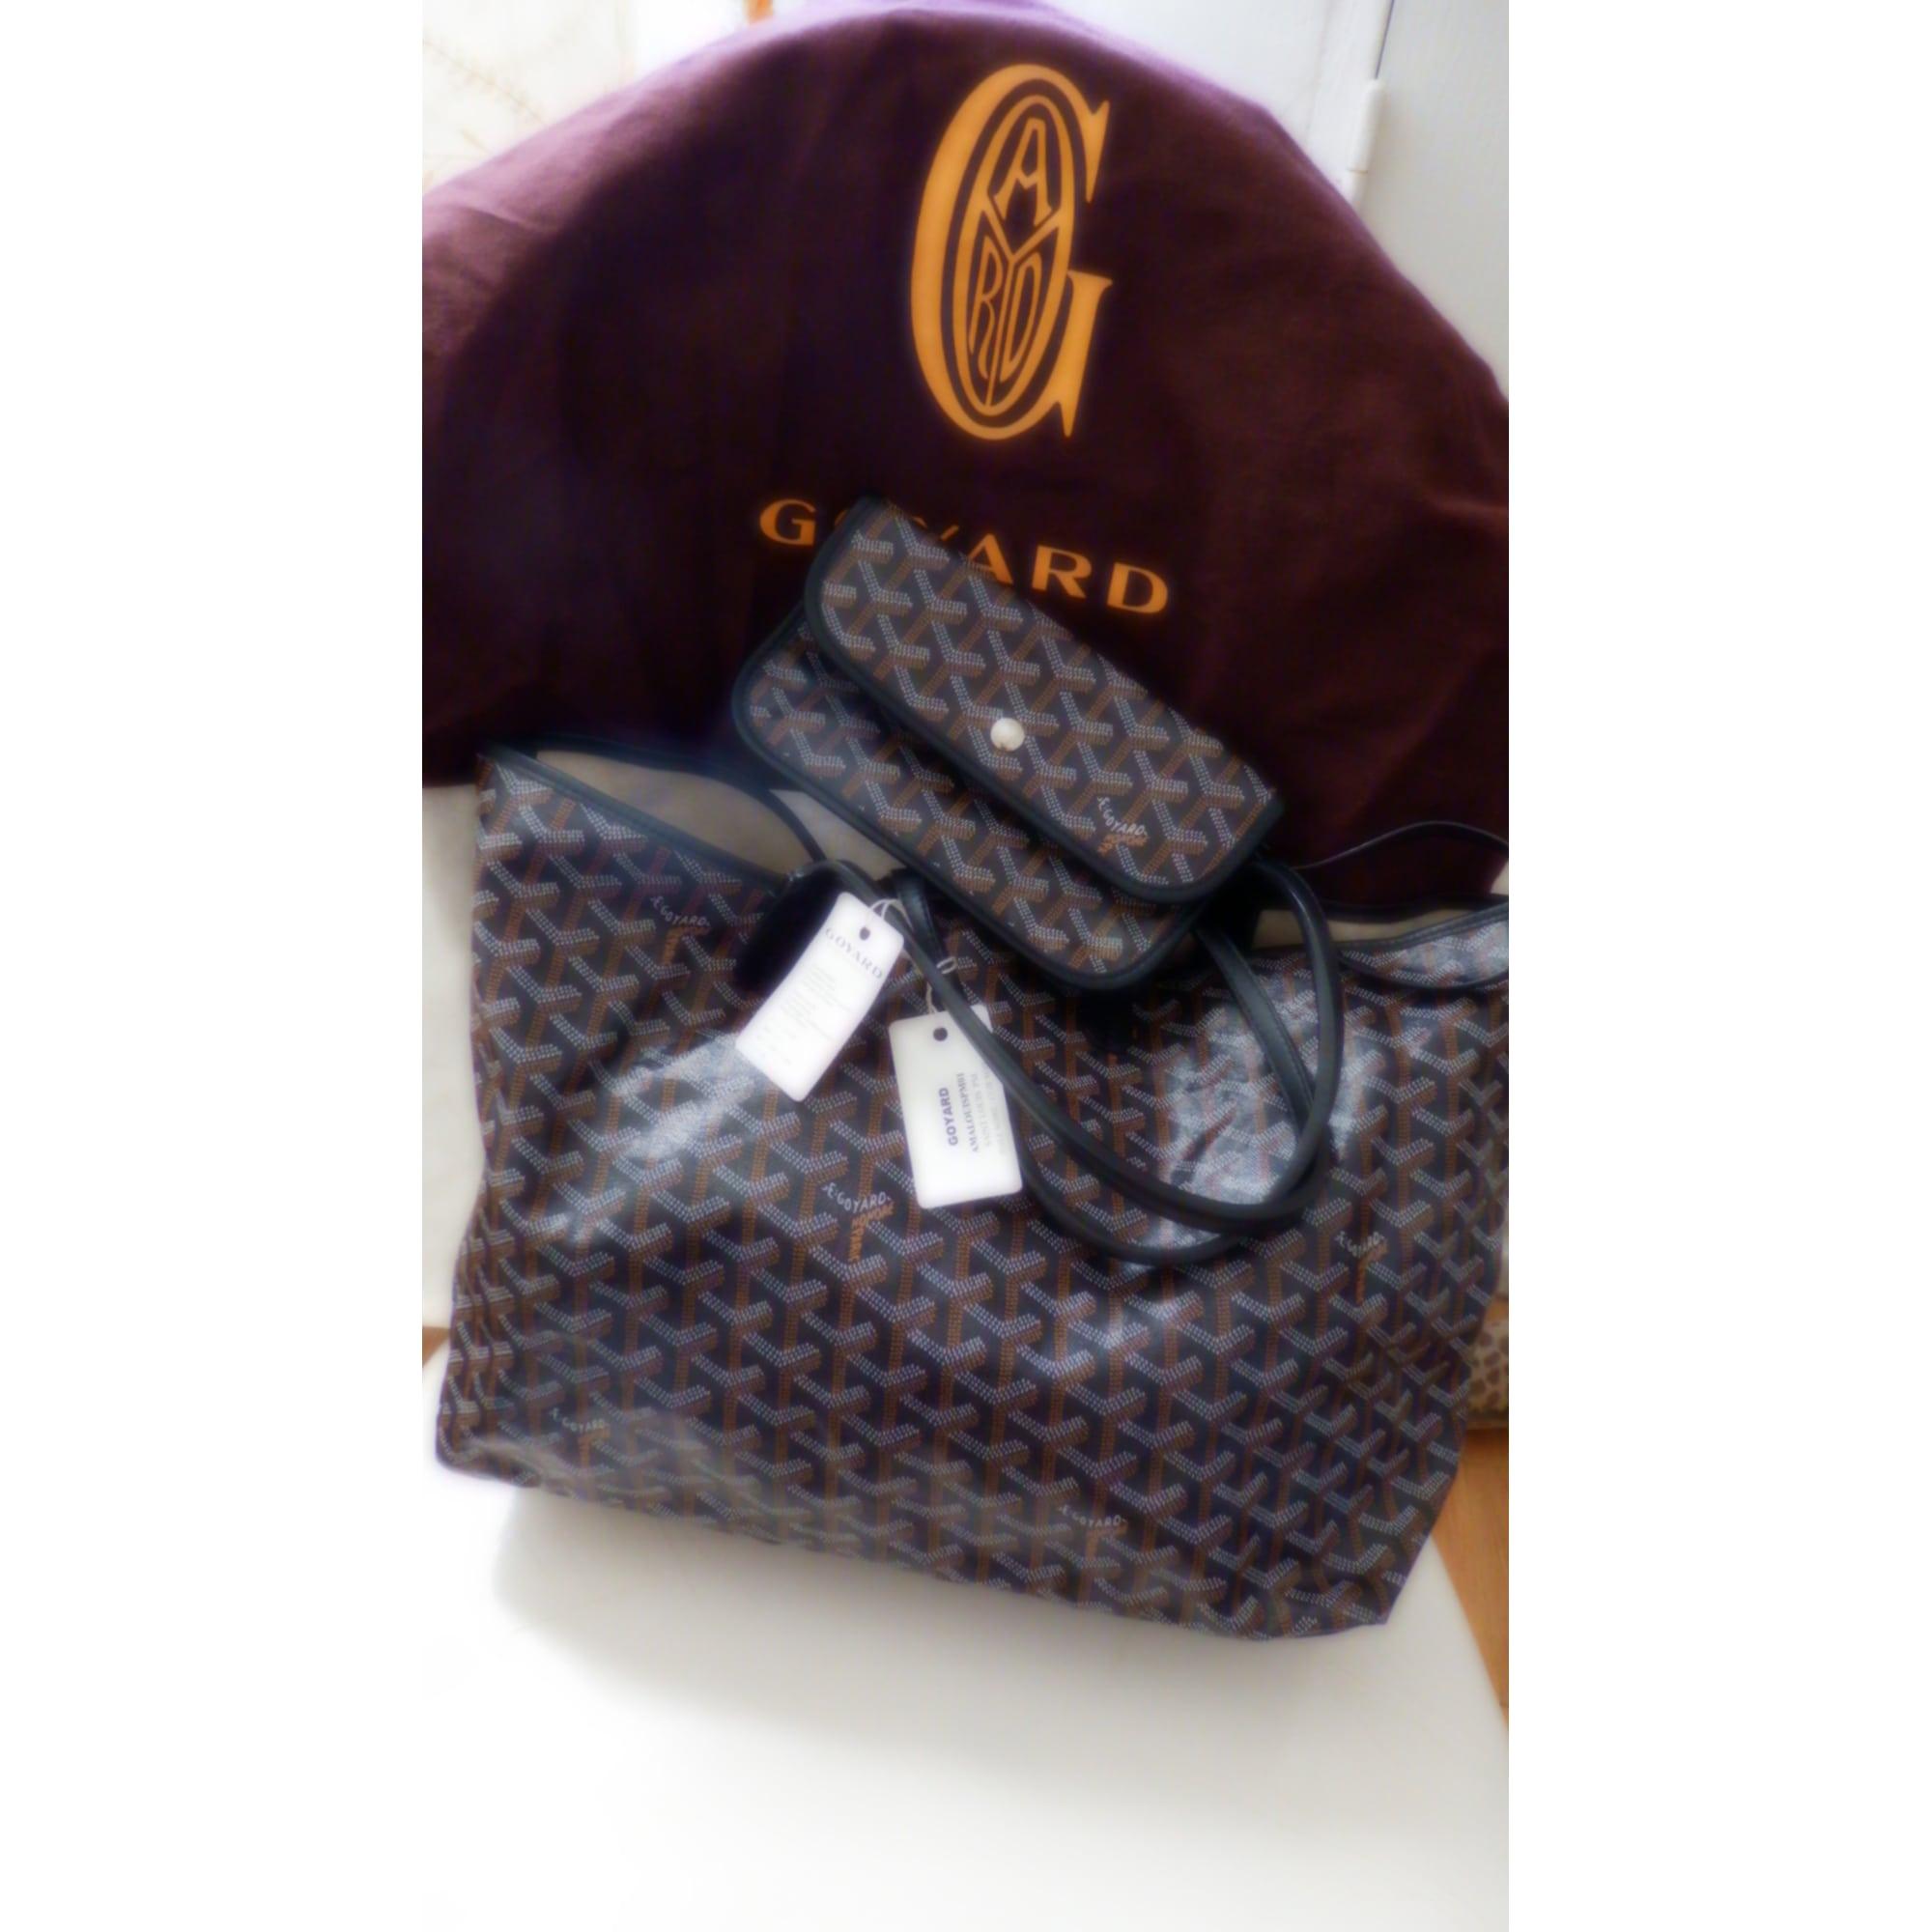 e66a917ec4 Sac à main en cuir GOYARD noir vendu par La boutique de san - 5159233